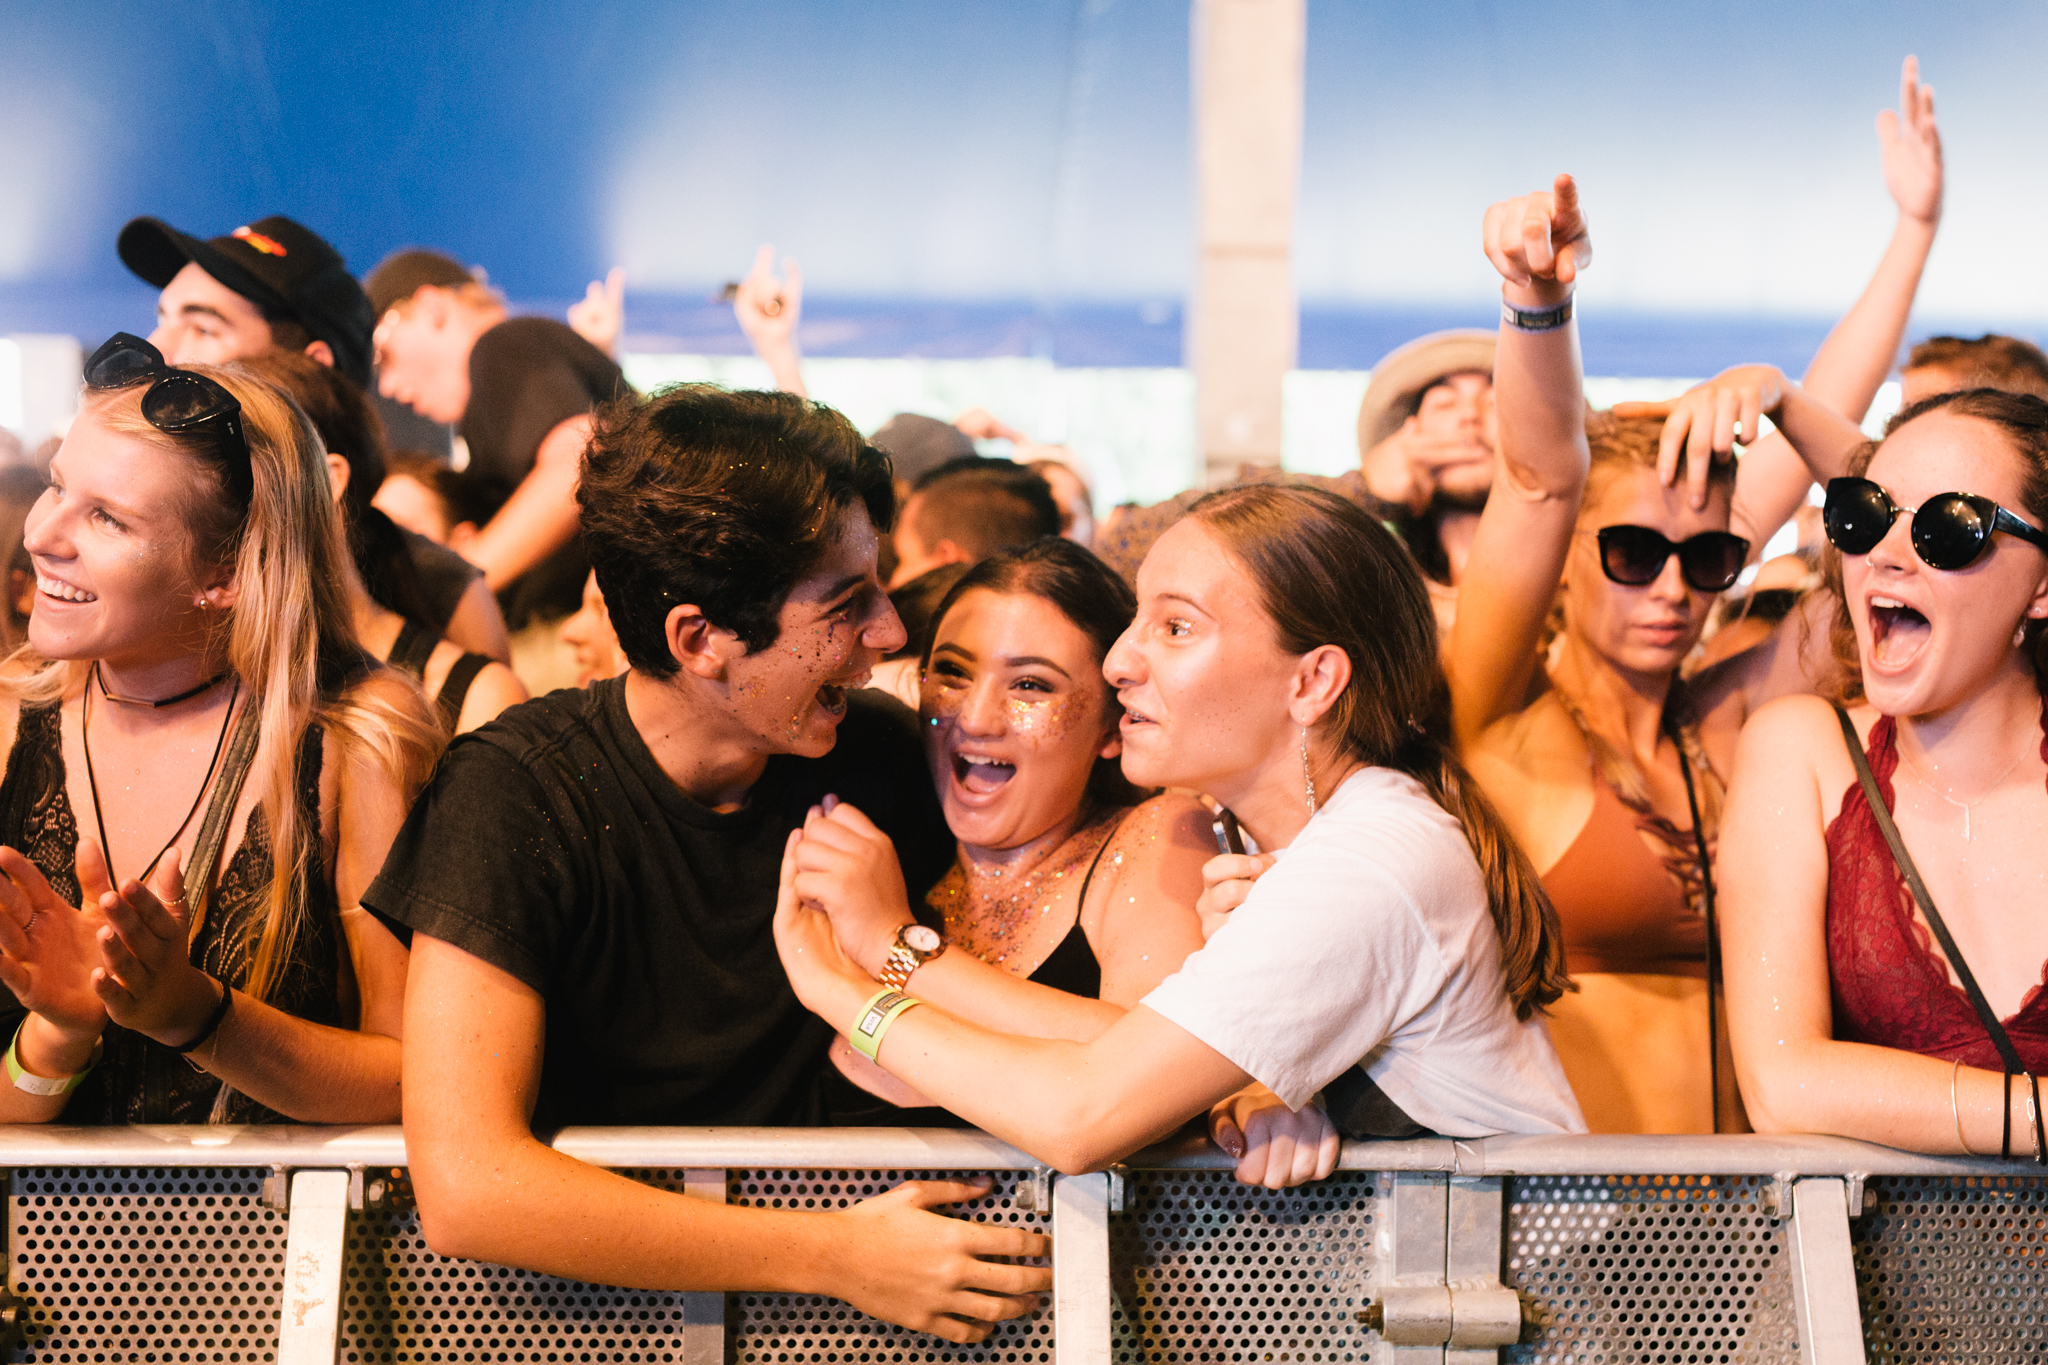 Atmosphere_Laneway-Festival-Brisbane-2017_credit-Bianca-Holderness-29.jpg